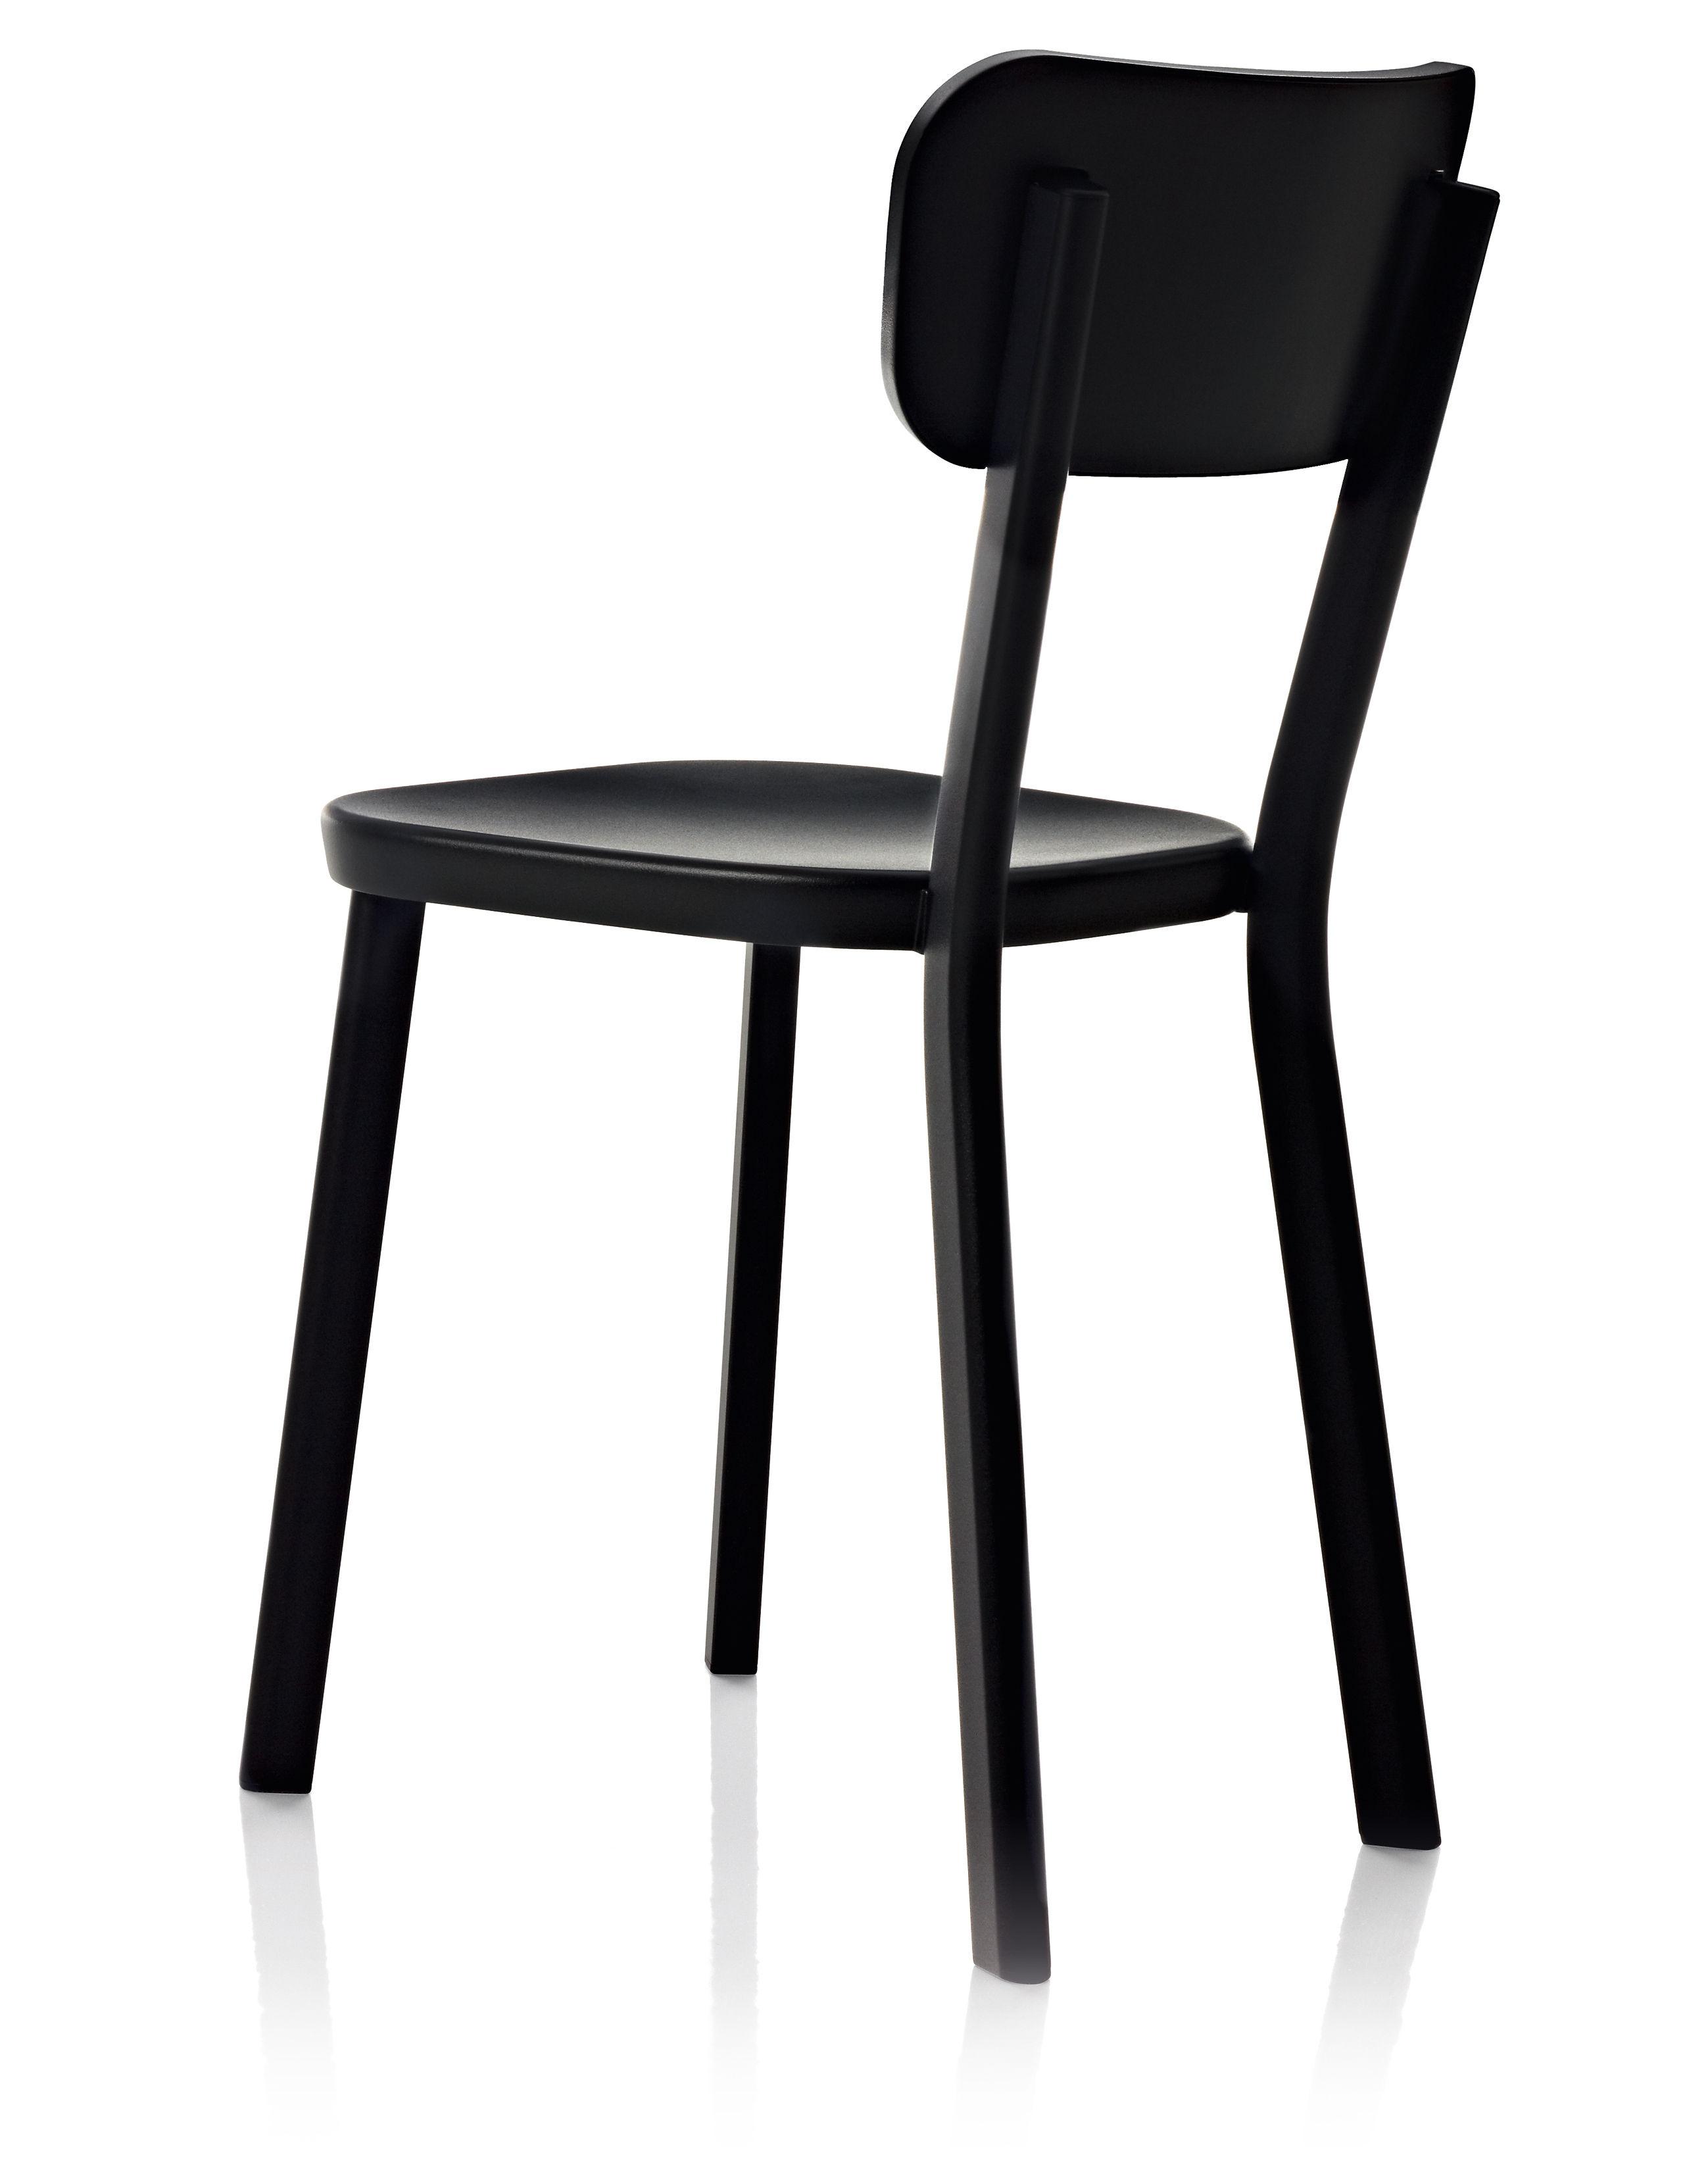 Möbel - Stühle  - Déjà-vu Stuhl Einfarbige Variante - Magis - Schwarz - klarlackbeschichtetes Aluminium